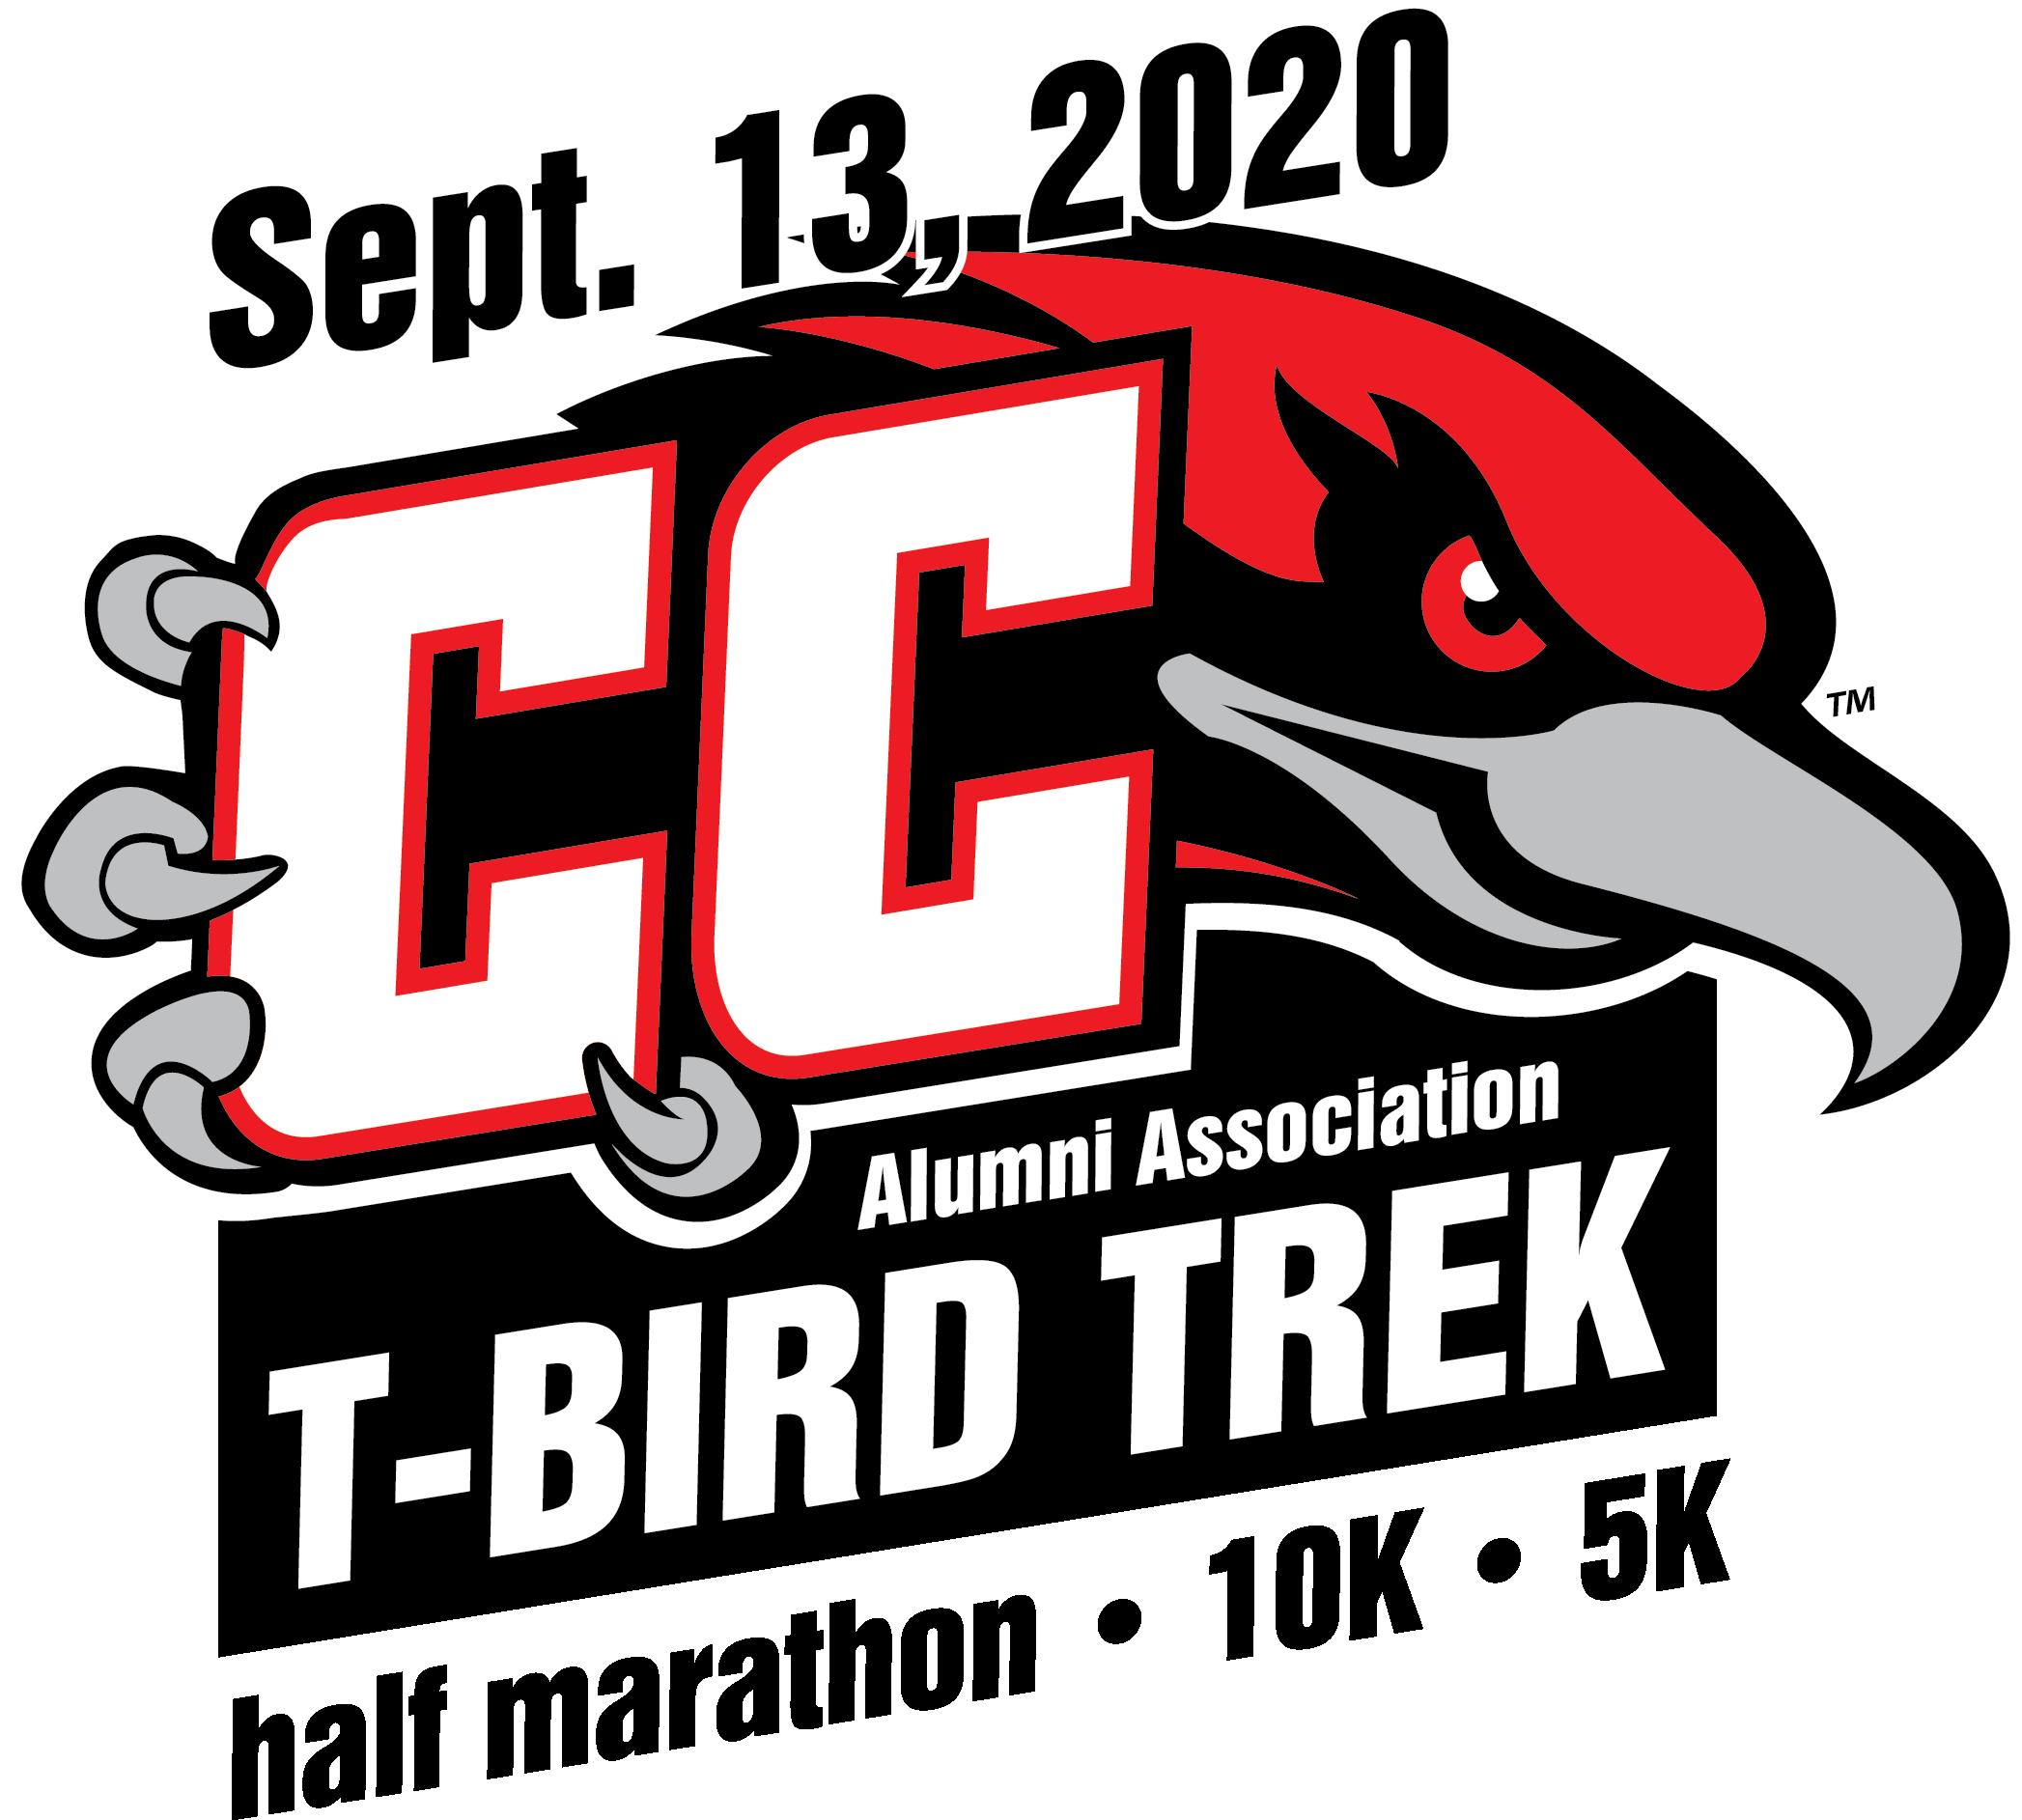 t-bird-trek-half-marathon-10k-and-5k-sponsor